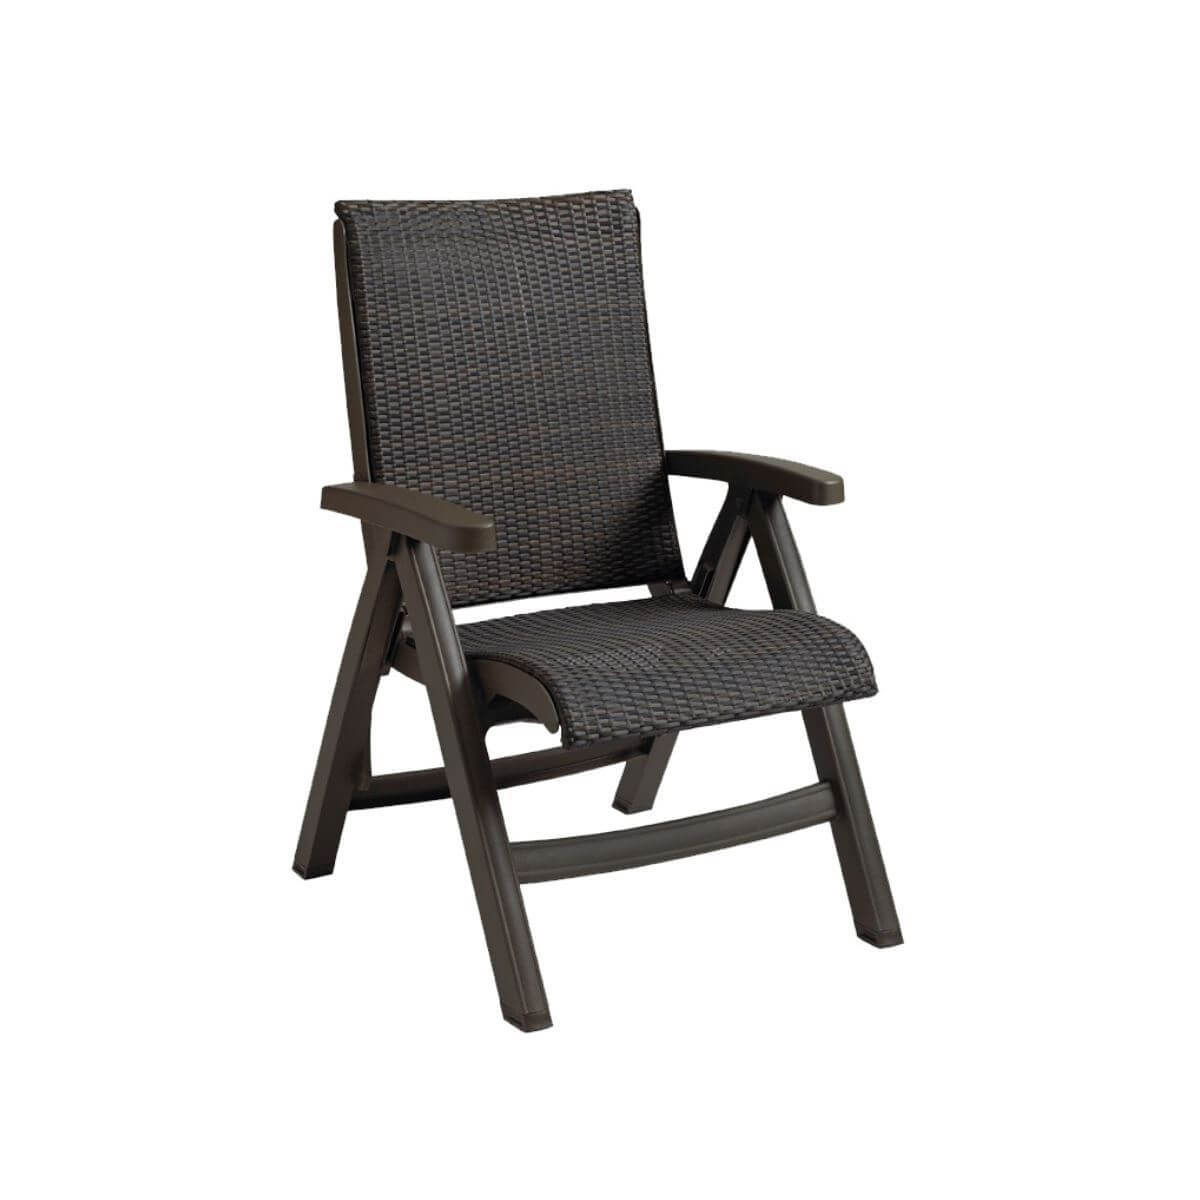 Java All Weather Wicker Folding Chair Espresso